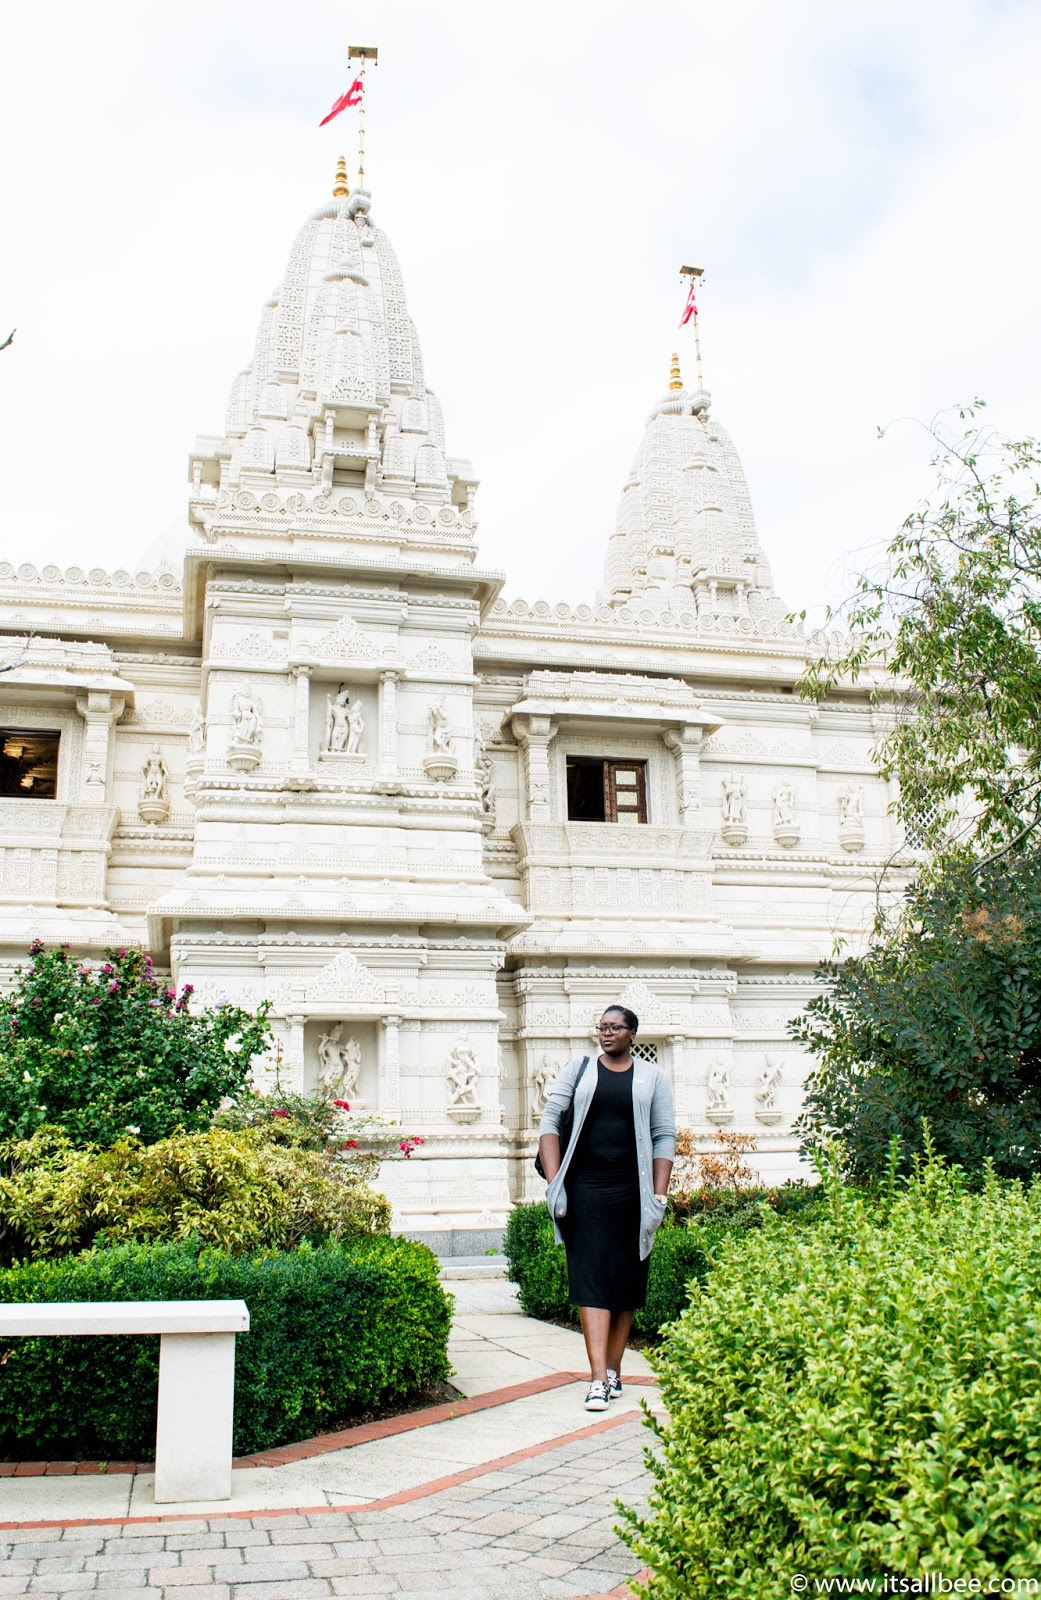 London's Insanely Beautiful Temple You Have To See - Neasden temple aka Baps Shri-Swaninarayan Mandir